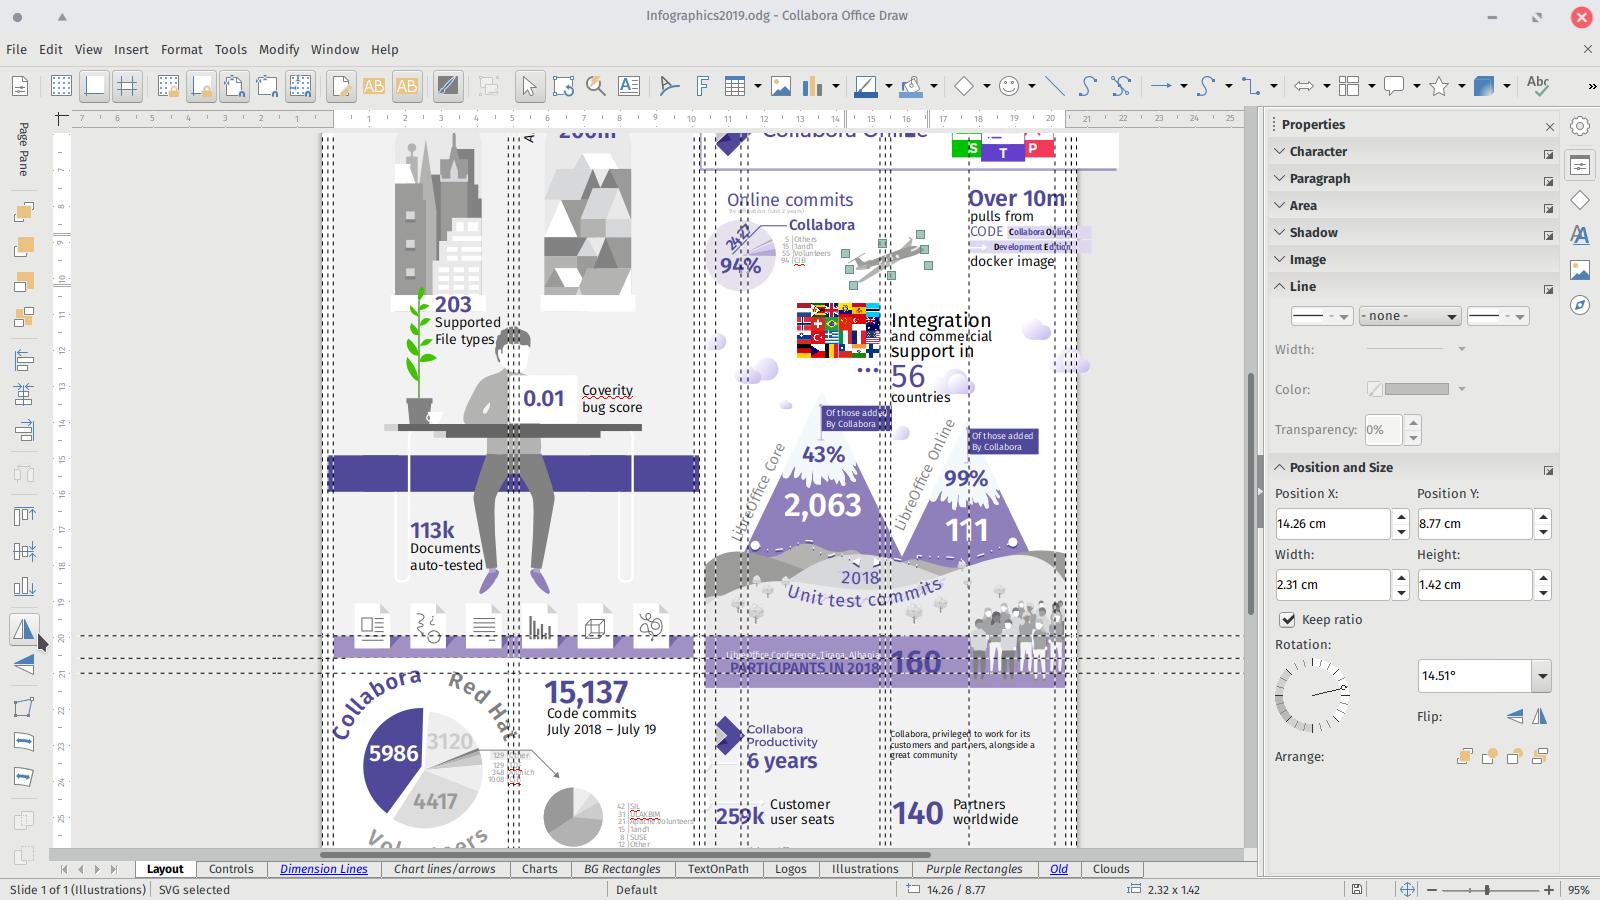 Screenshot: Using CollaboraOffice, Draw Customized